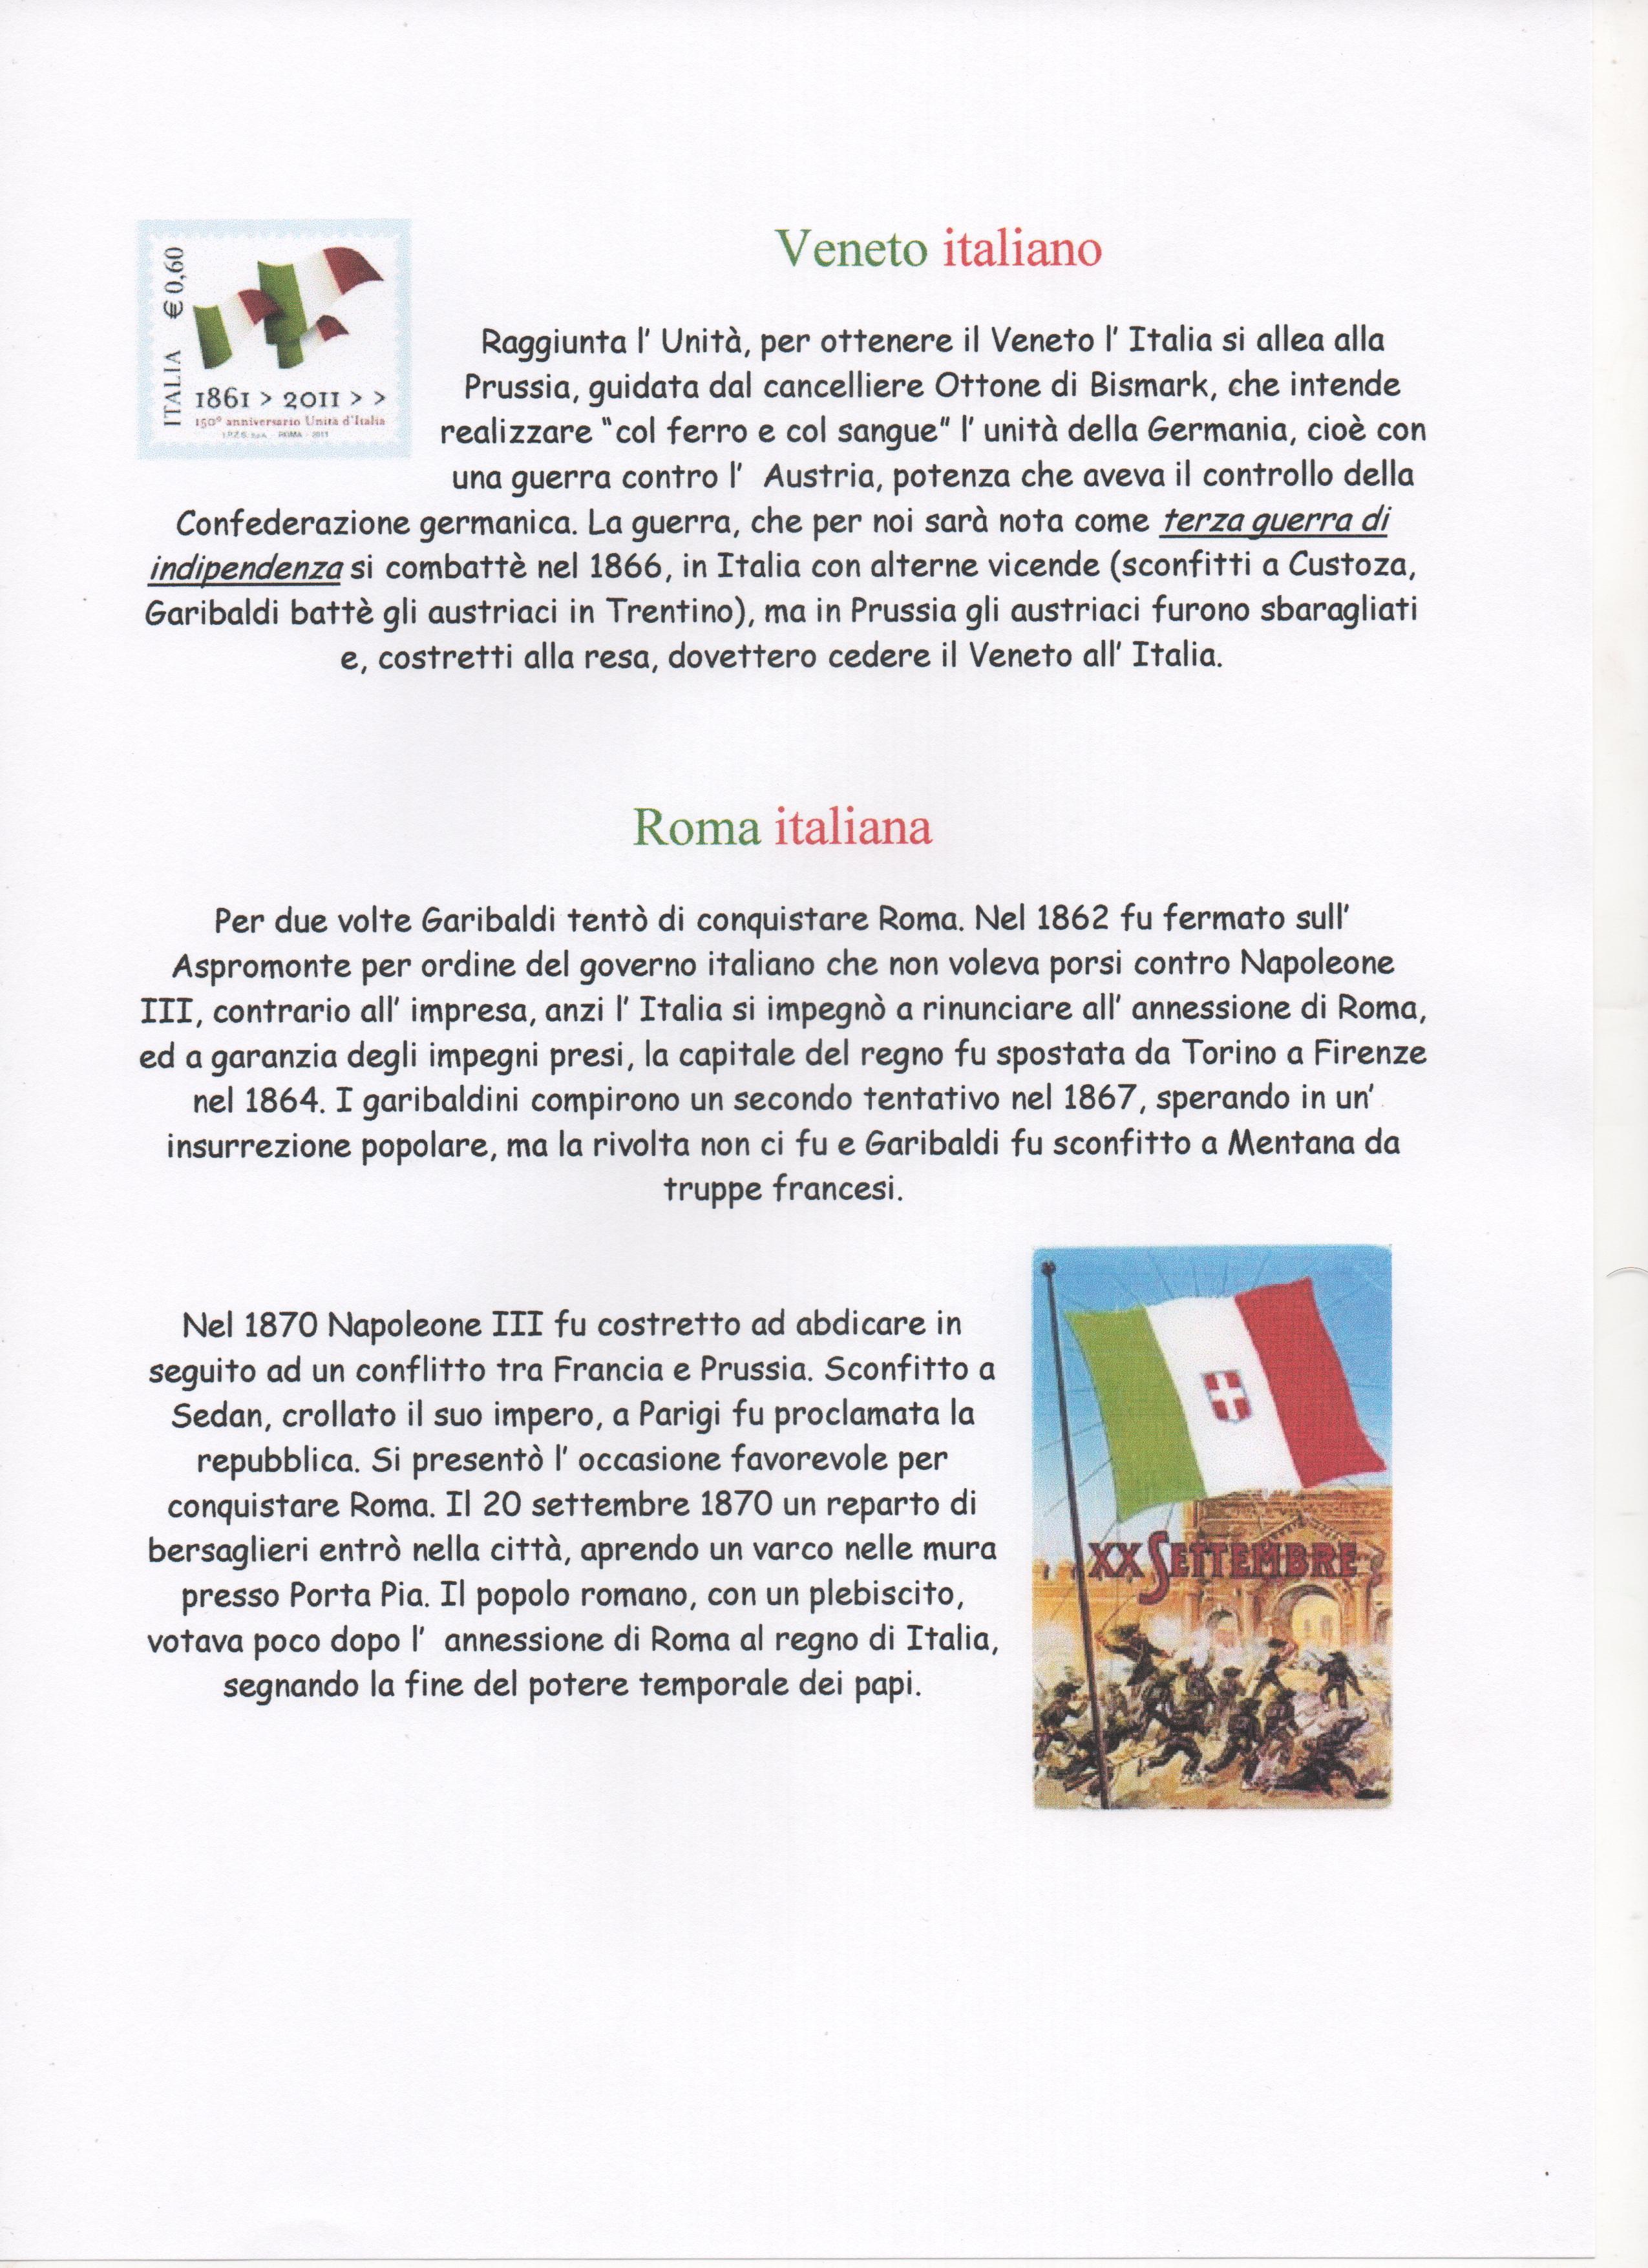 4_4_terre_irredente